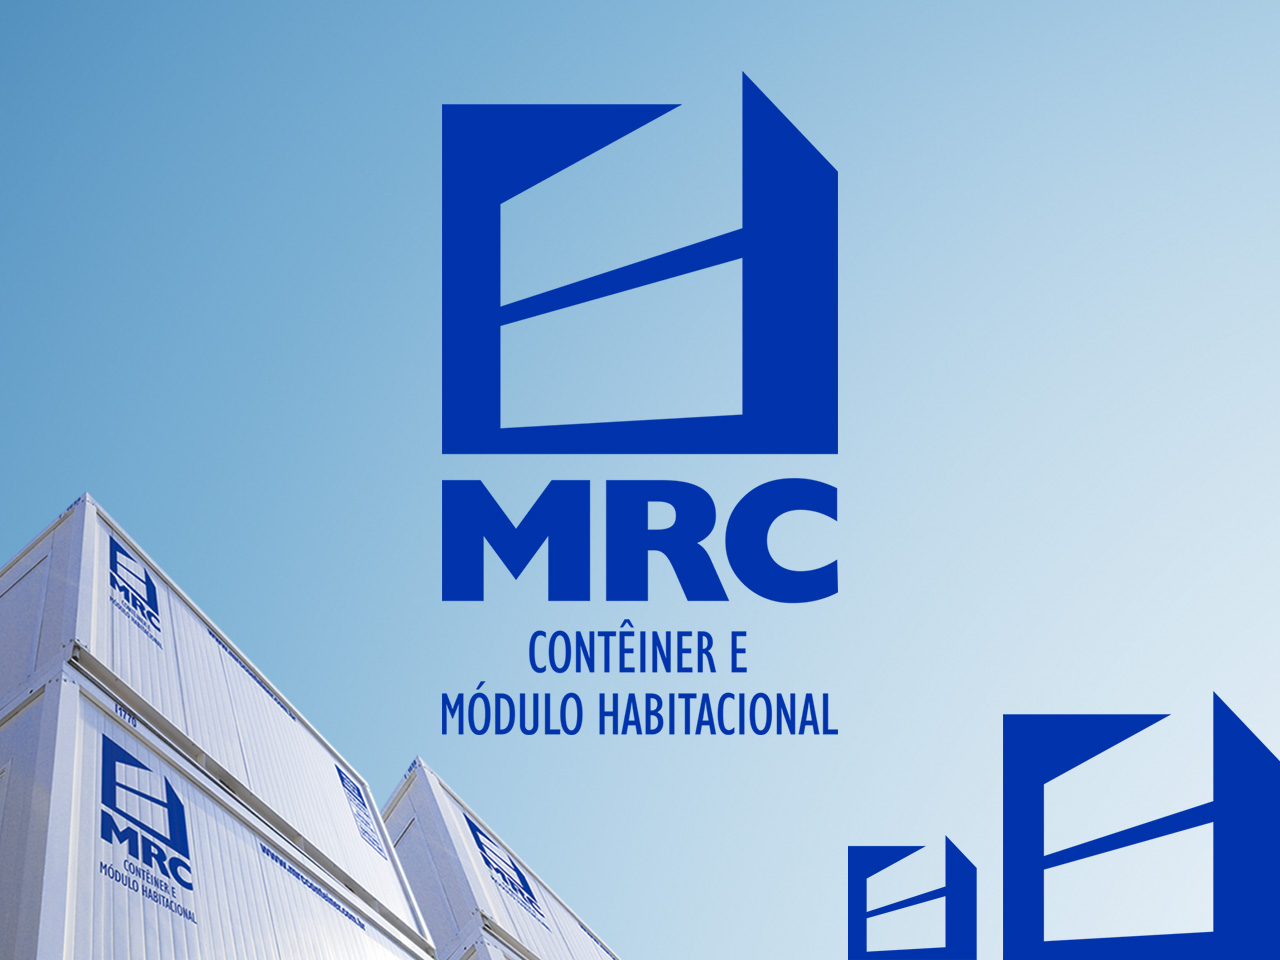 MRC – Contêiner e Módulo Habitacional